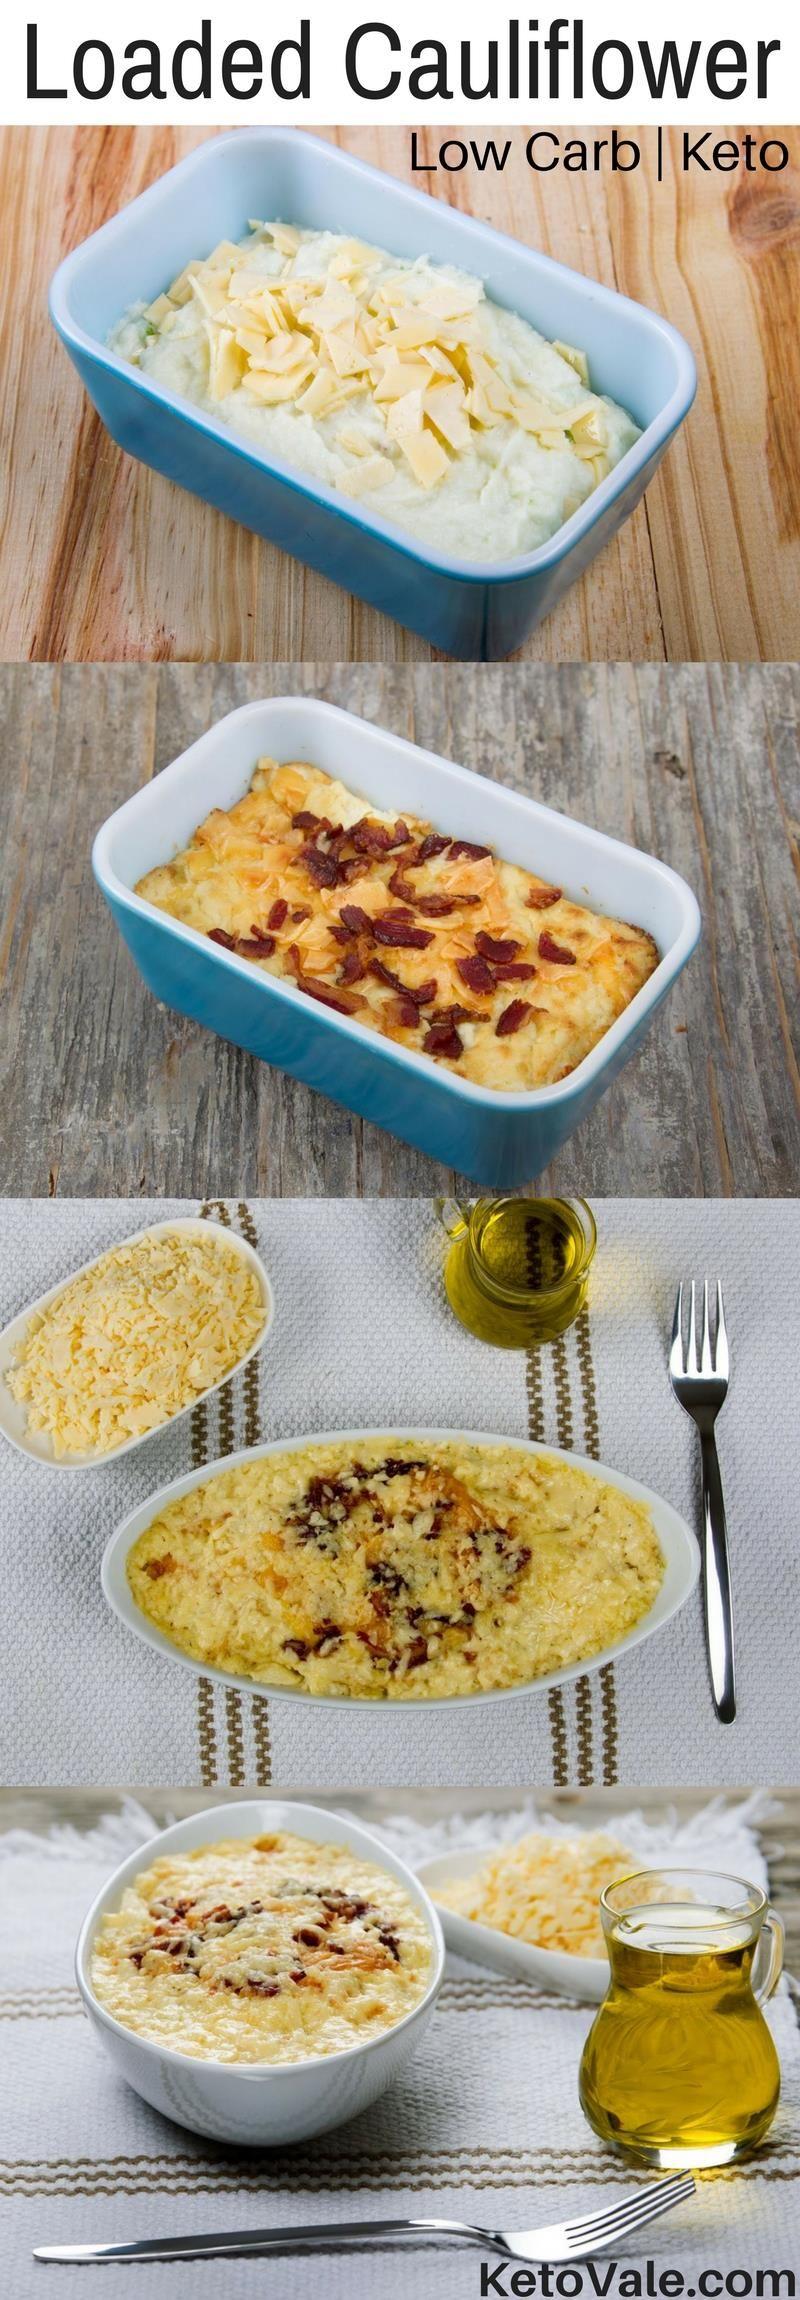 Cheesy Loaded Cauliflower Bake Low Carb Recipe